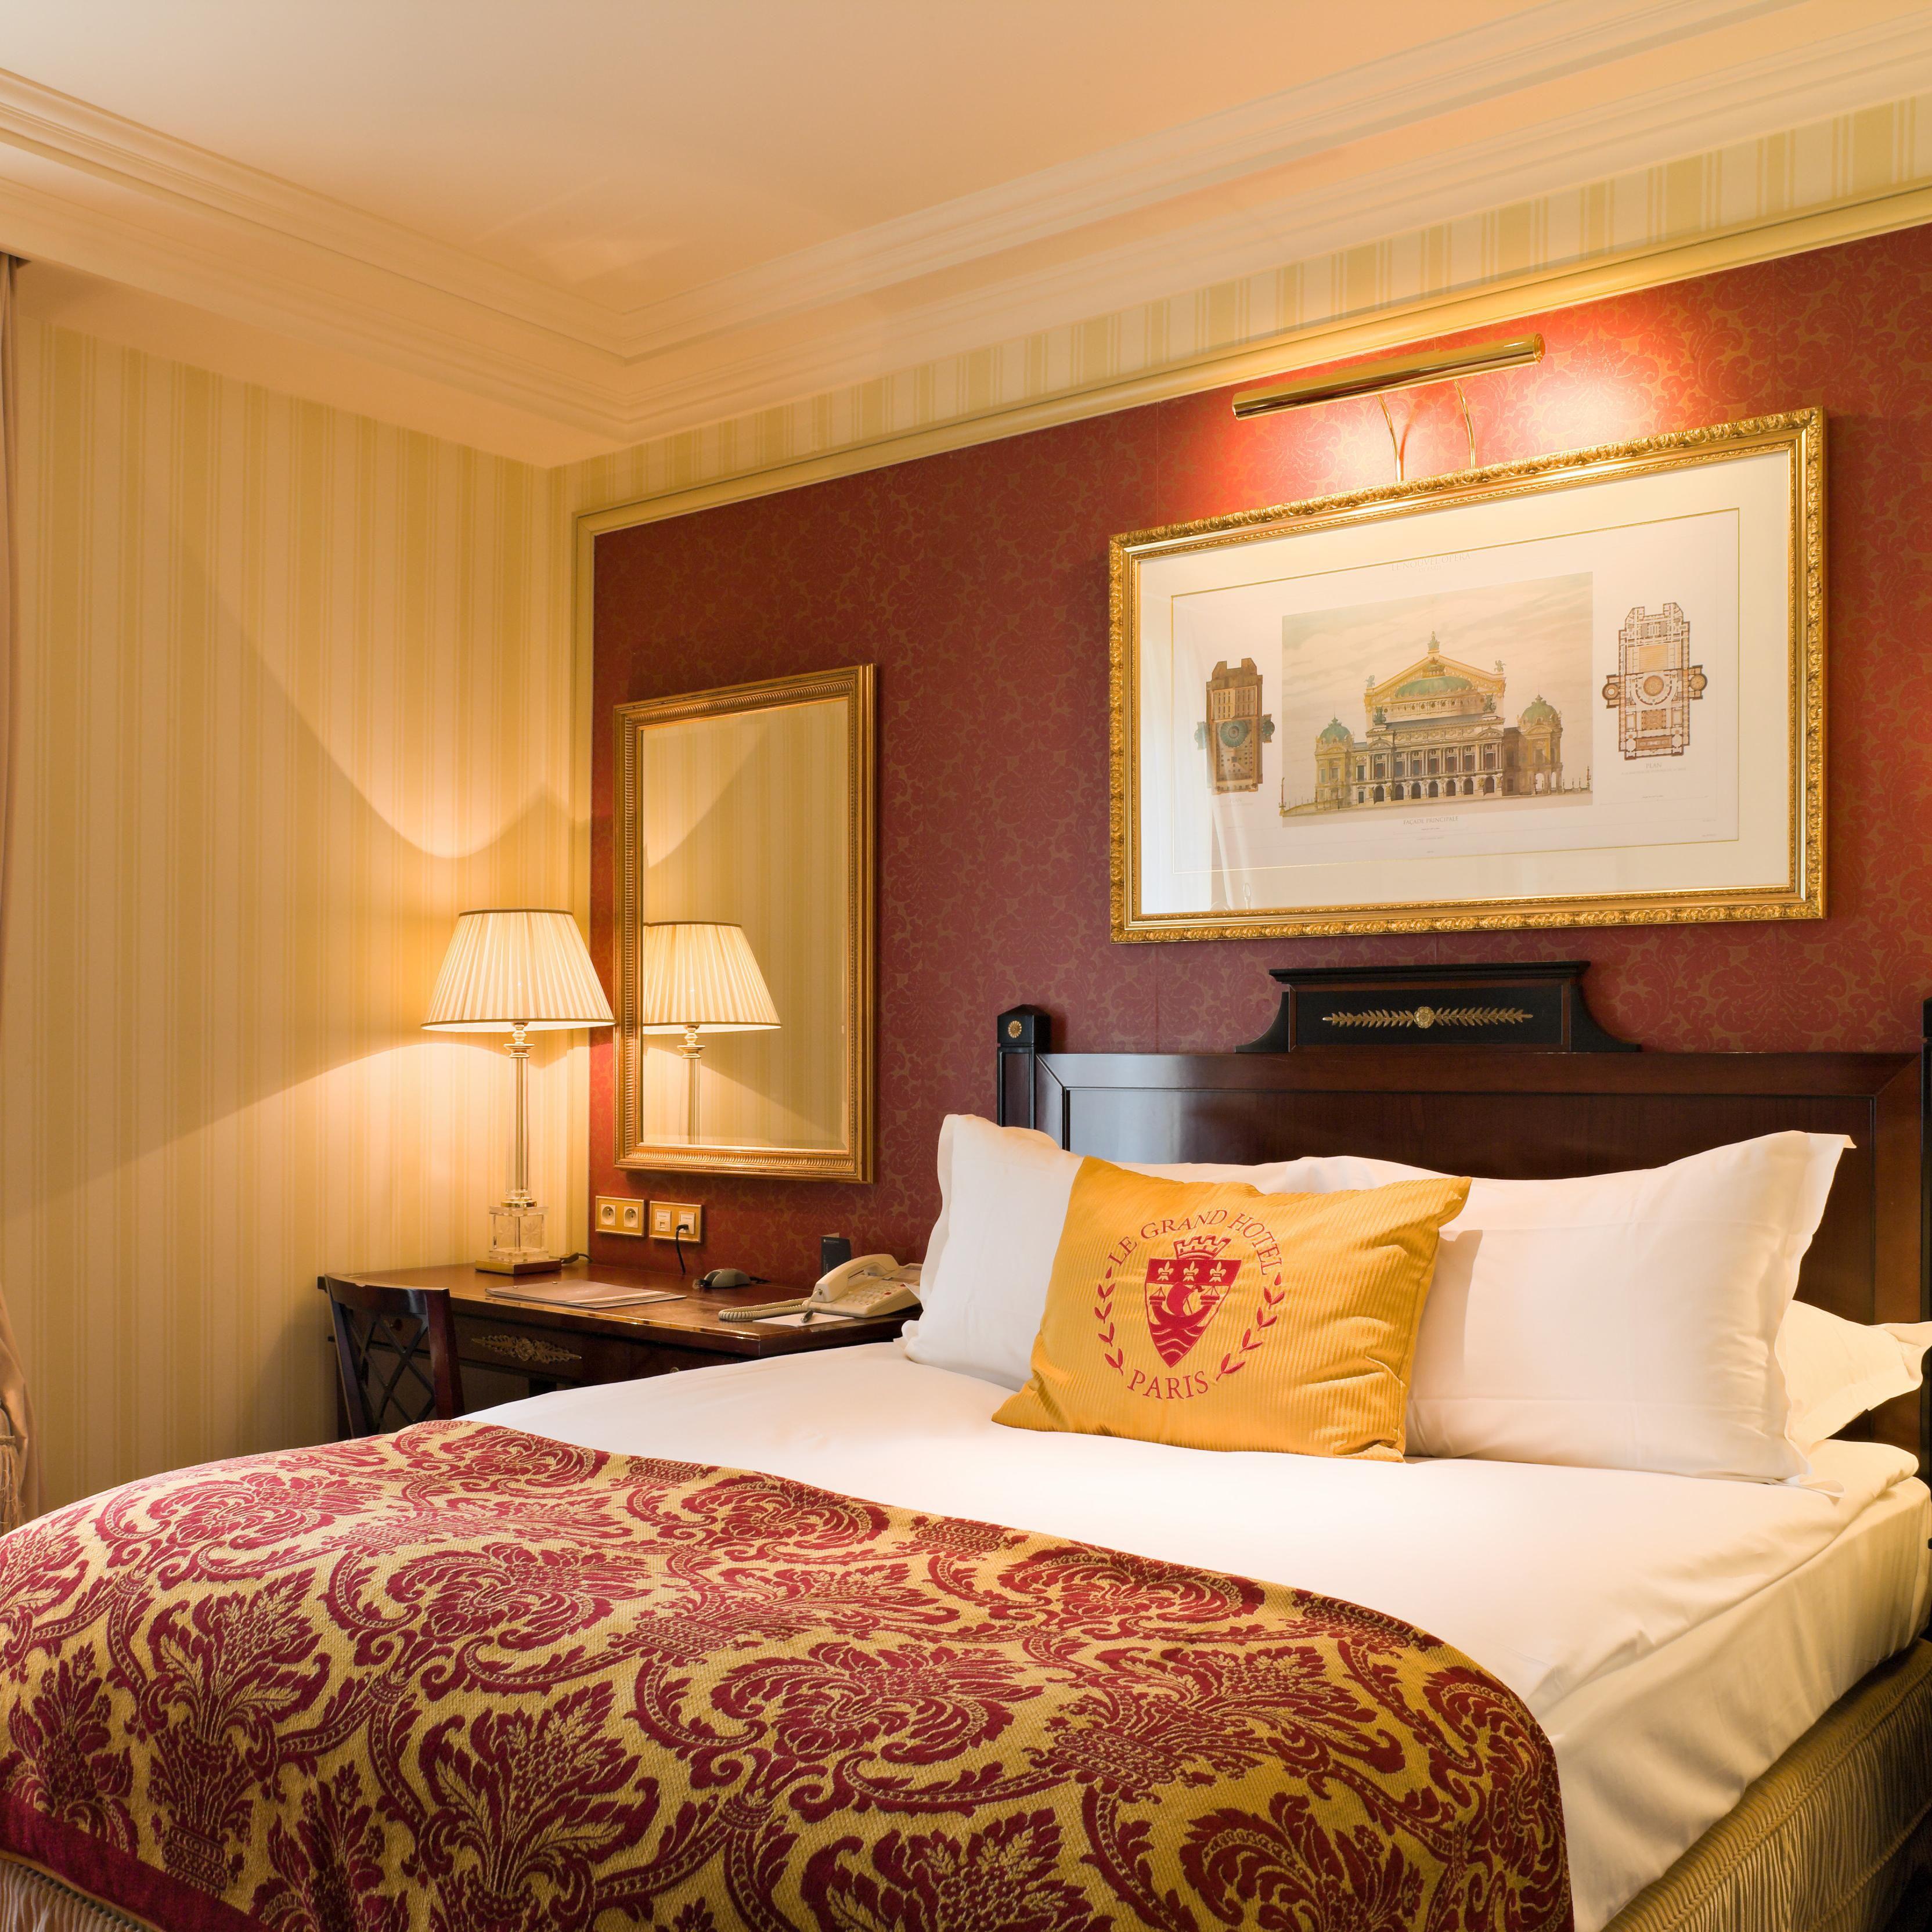 Paris Hotels InterContinental Paris Le Grand Hotel in Paris France